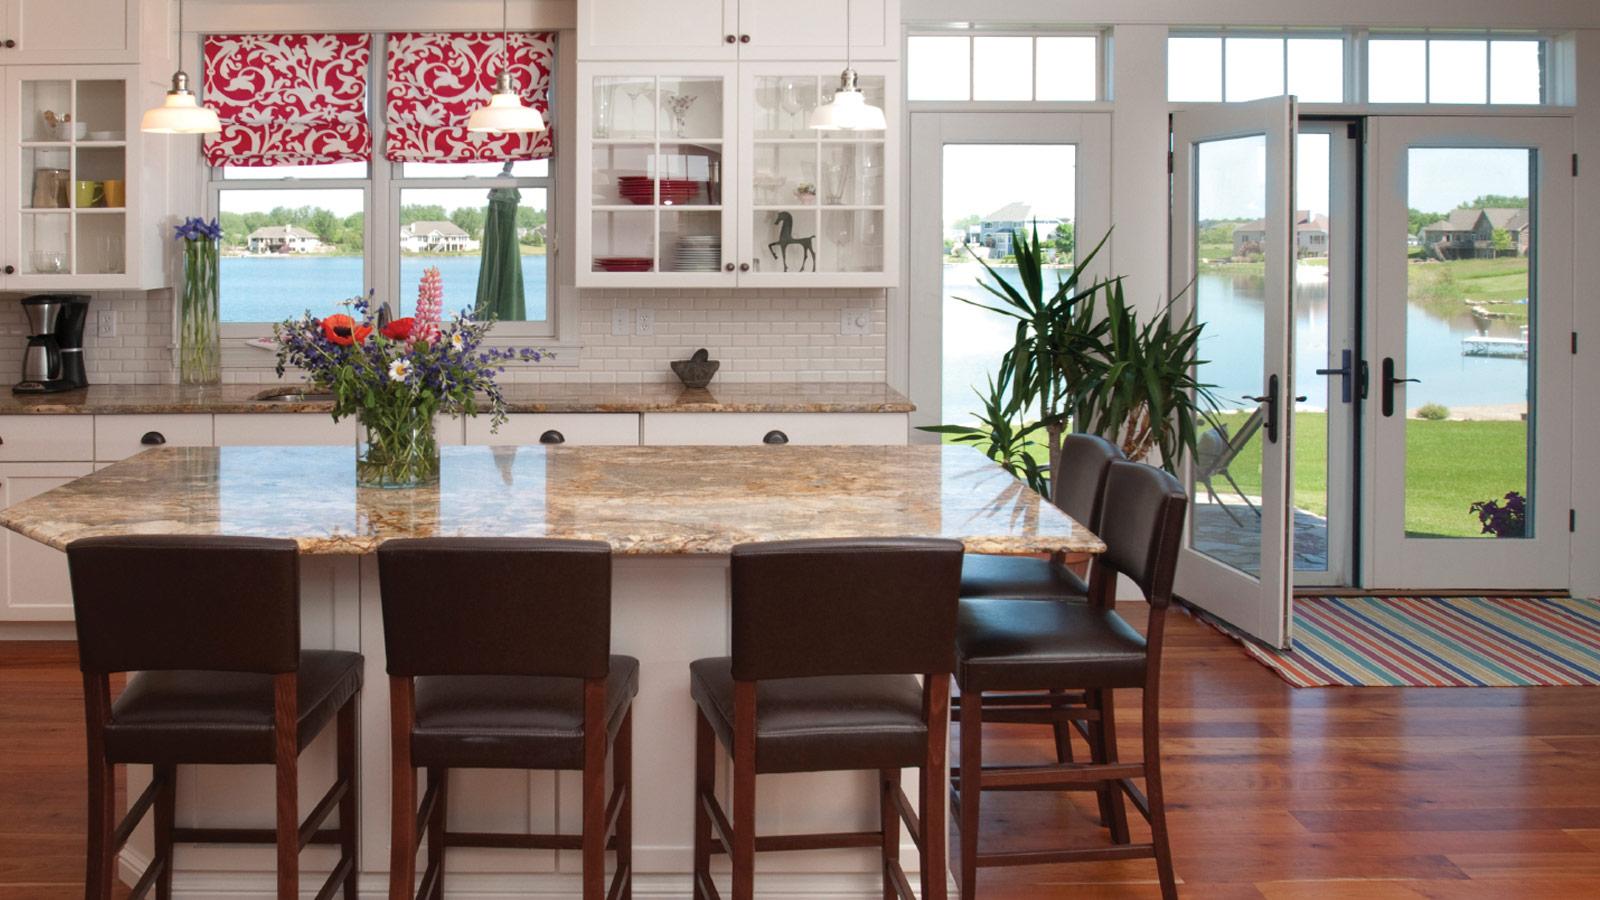 Meshtec | Unique Home Designs